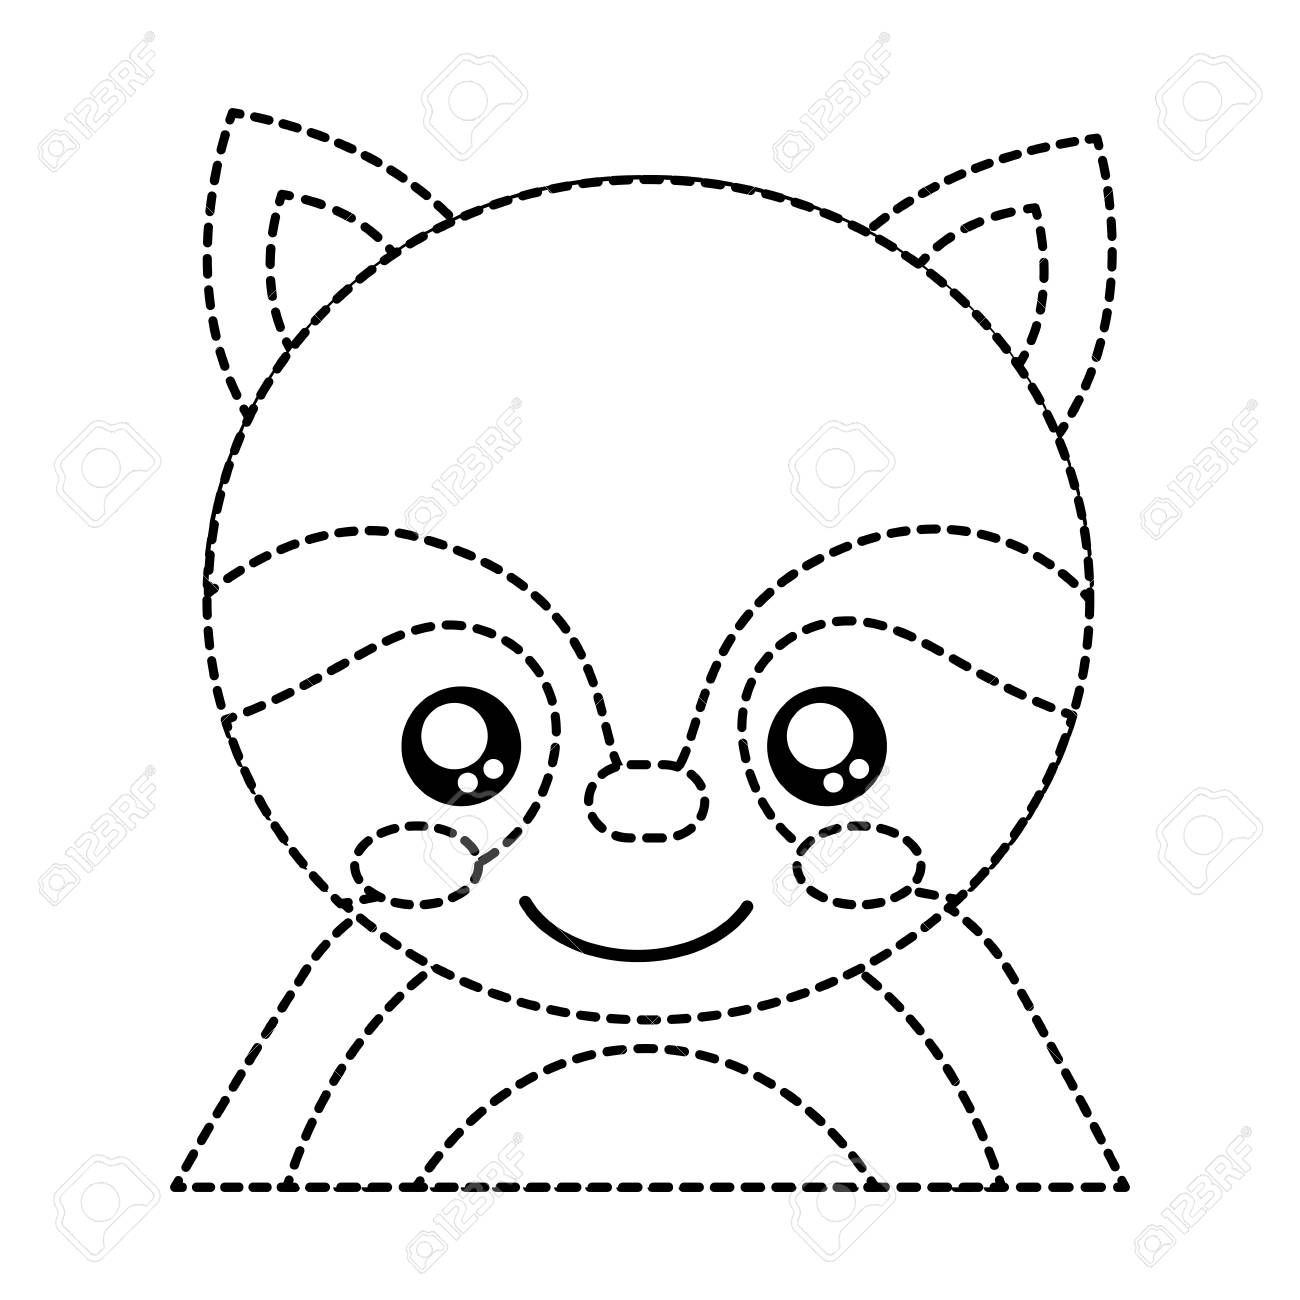 Raccoon Cute Animal Icon Image Vector Illustration Design